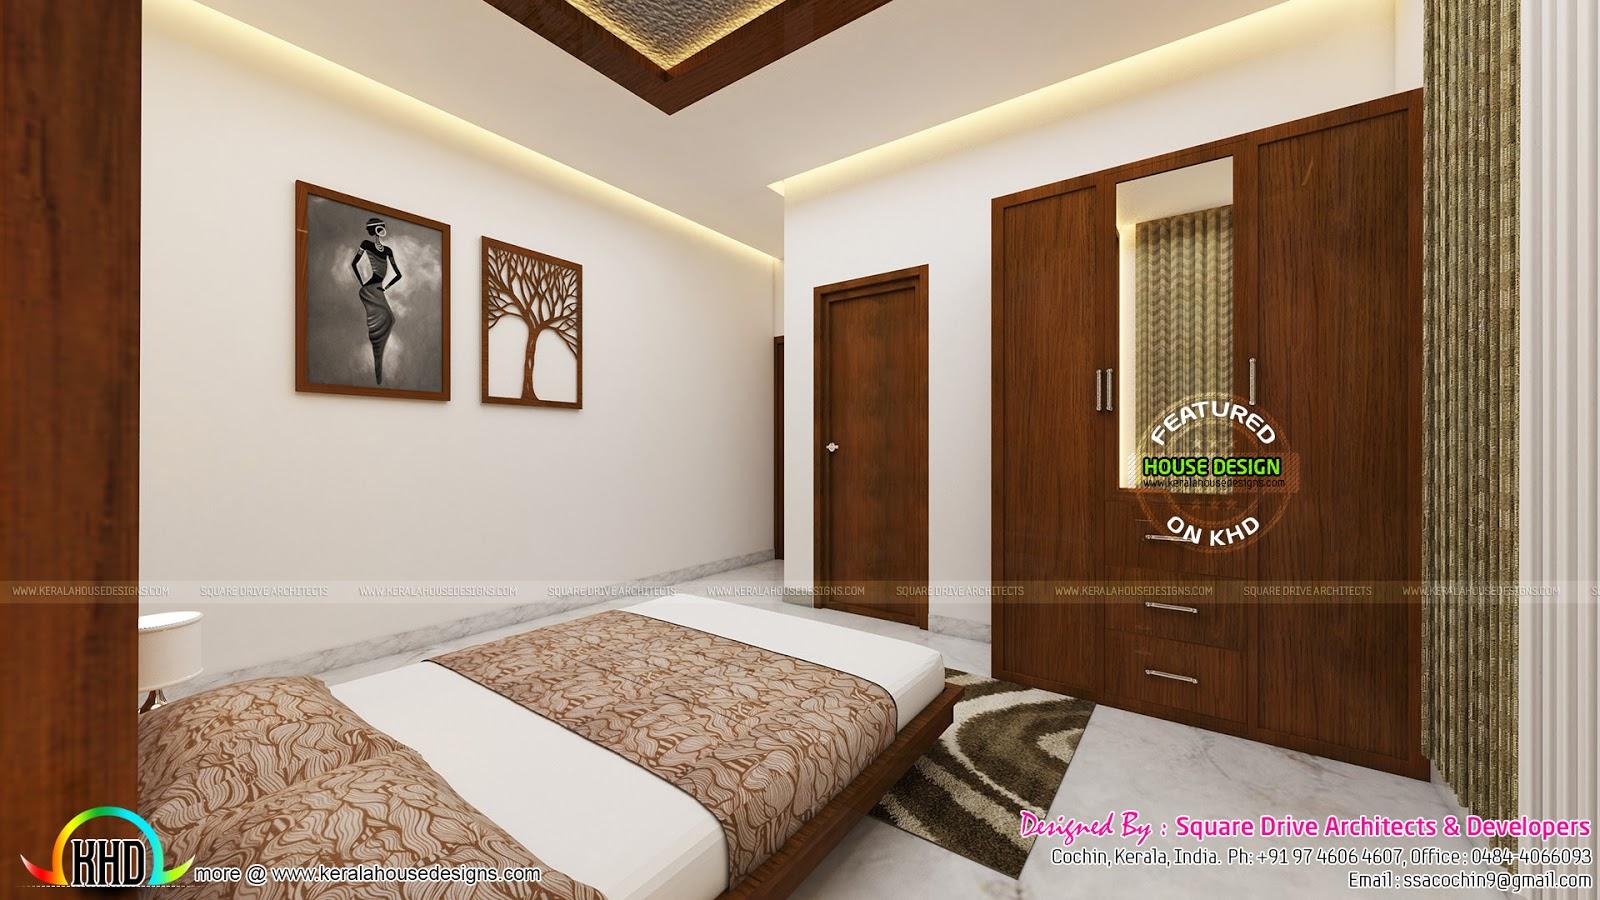 Bedrooms interior design kerala kerala home design and for Bedroom designs kerala